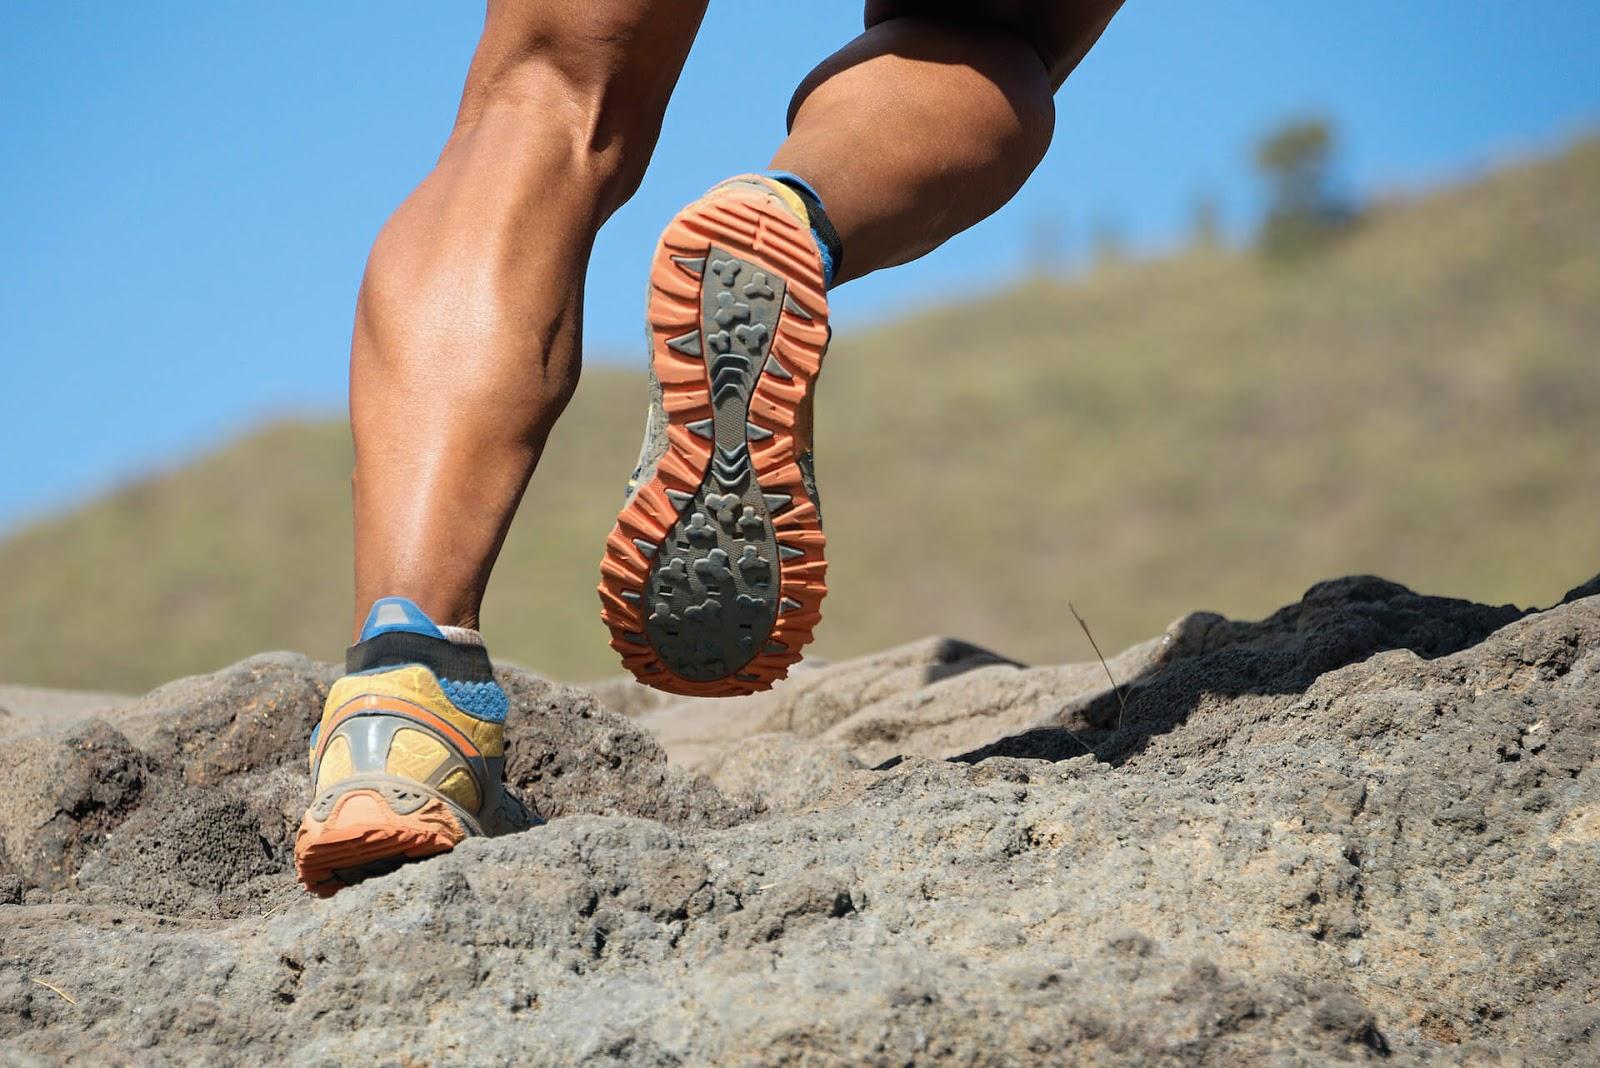 Close up of man's calves as he runs up rocks